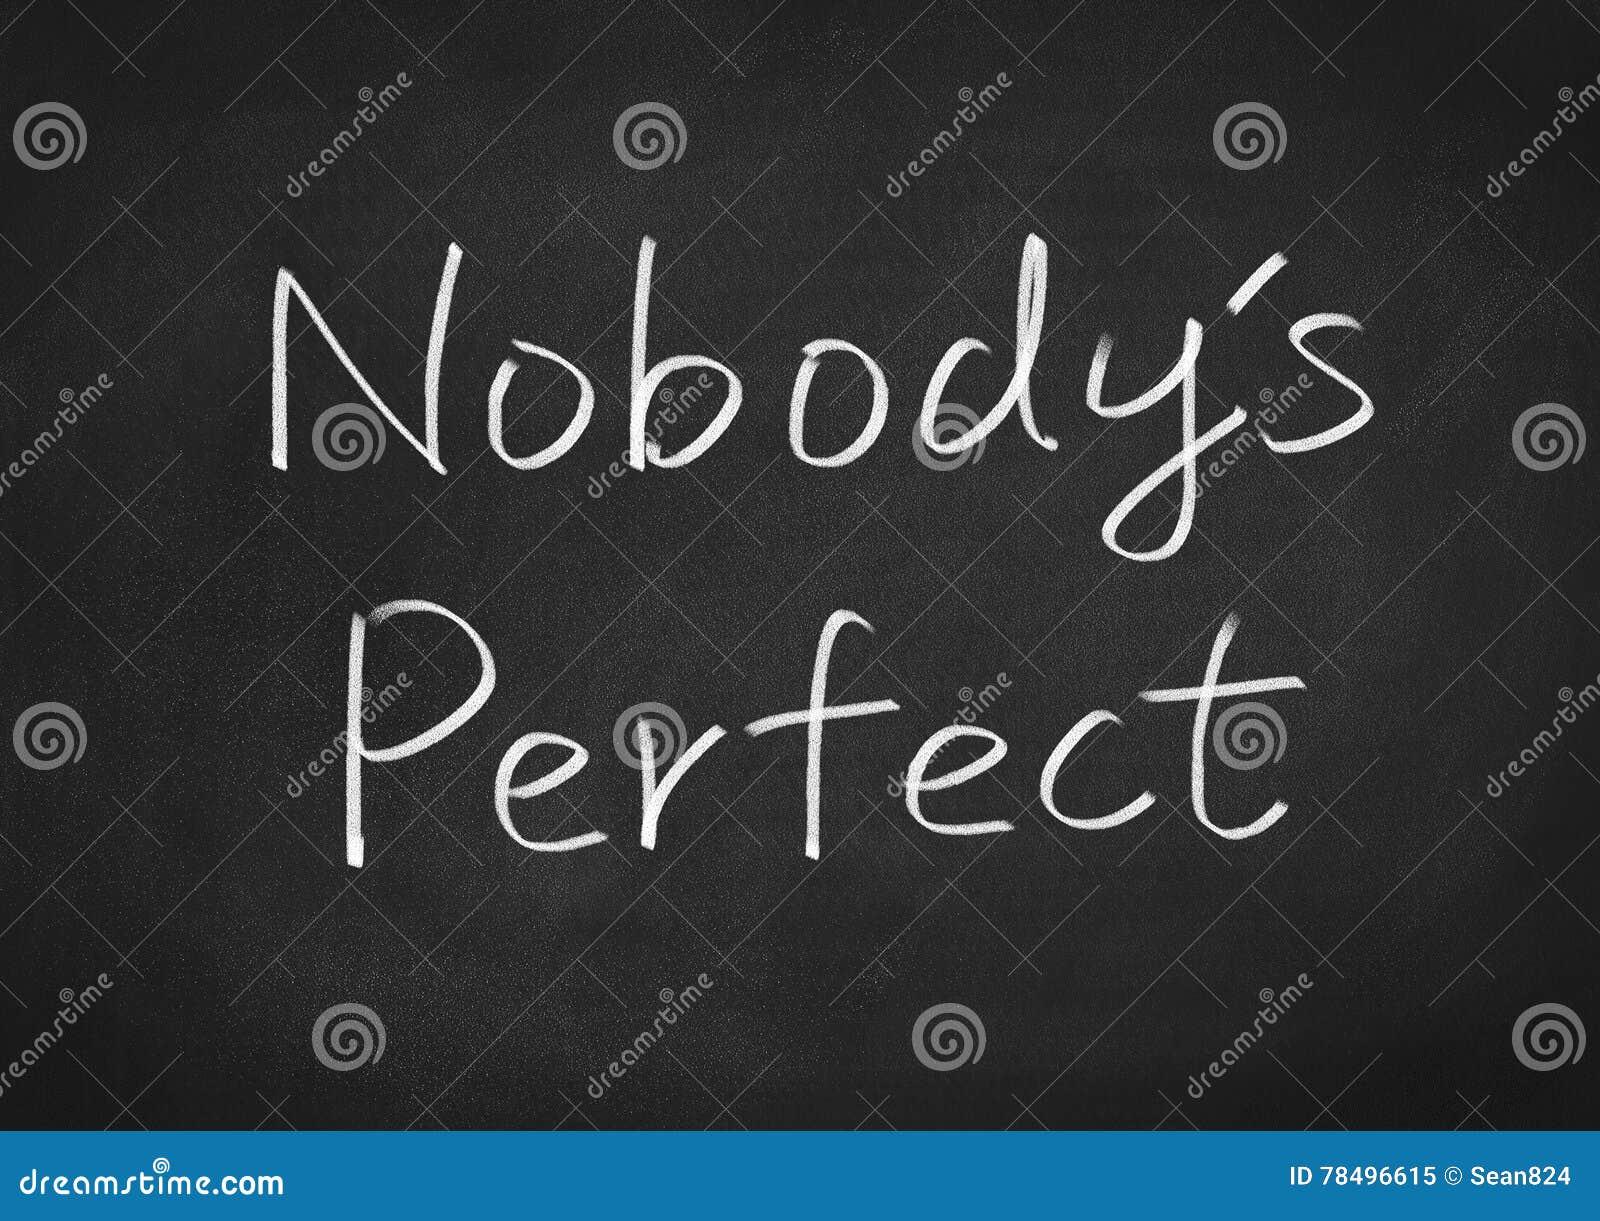 nobody 39 s perfect stock illustration image 78496615. Black Bedroom Furniture Sets. Home Design Ideas